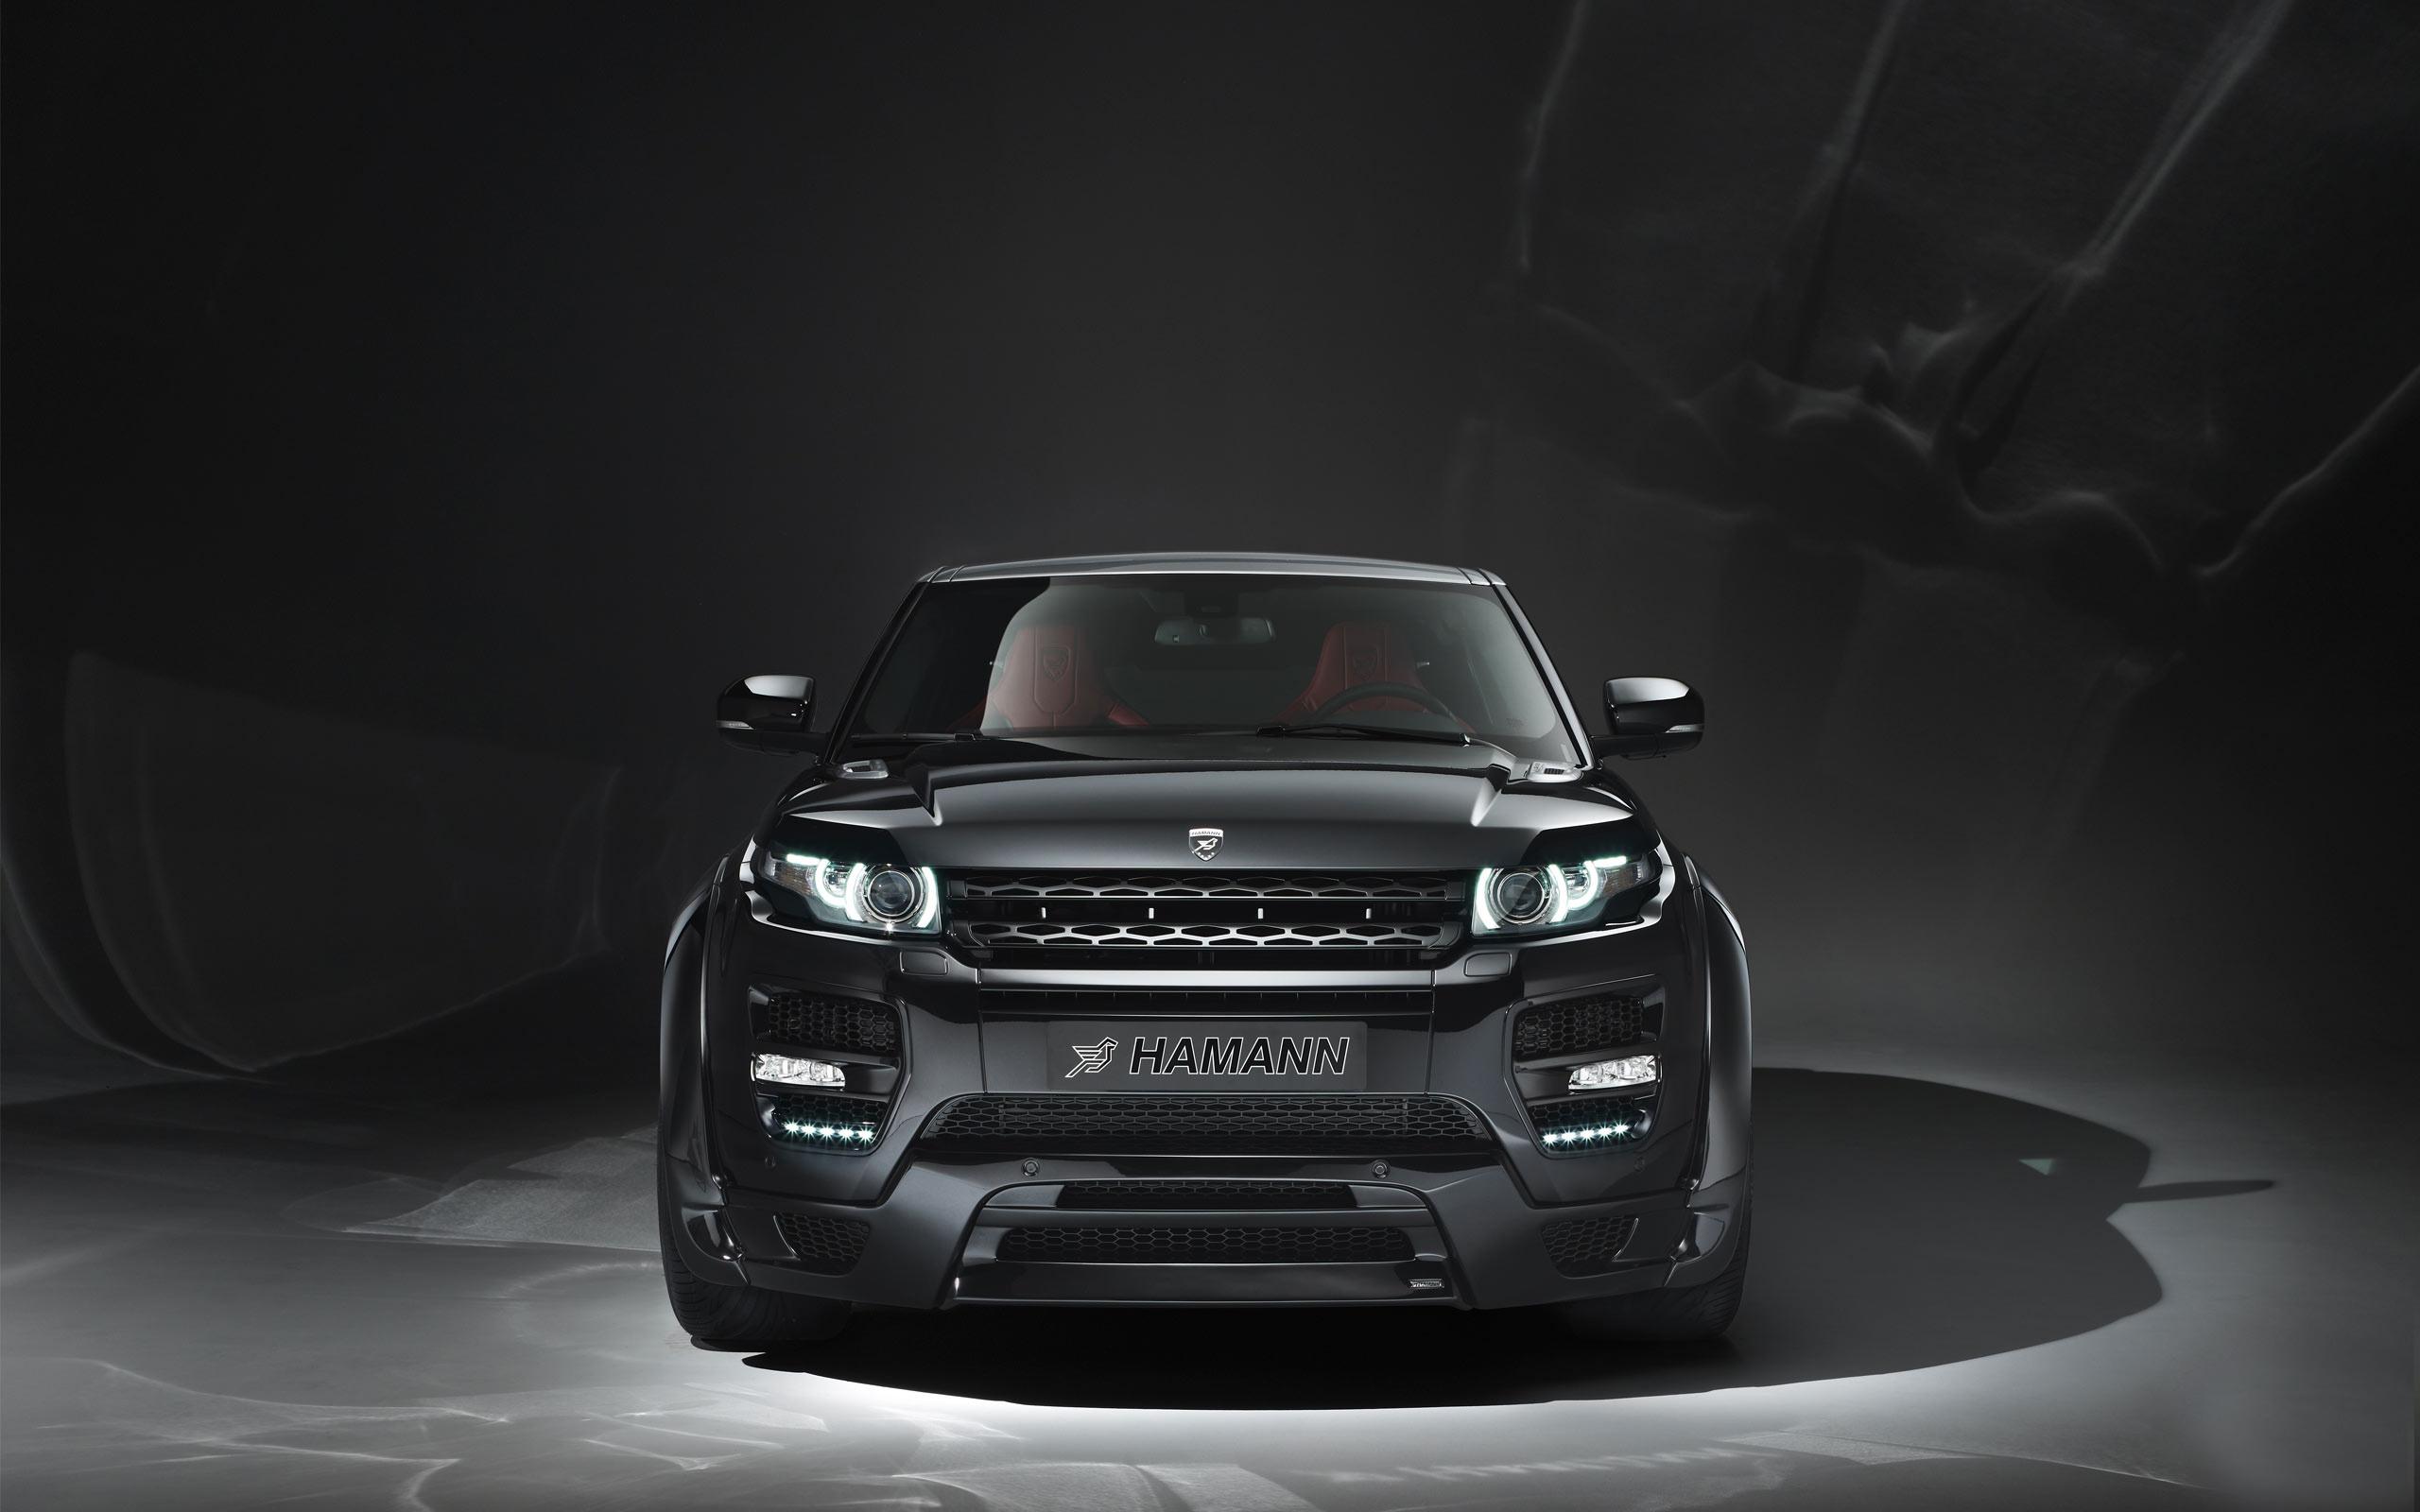 2012 Range Rover Evoque Hamann 2 Wallpaper Hd Car Wallpapers Id